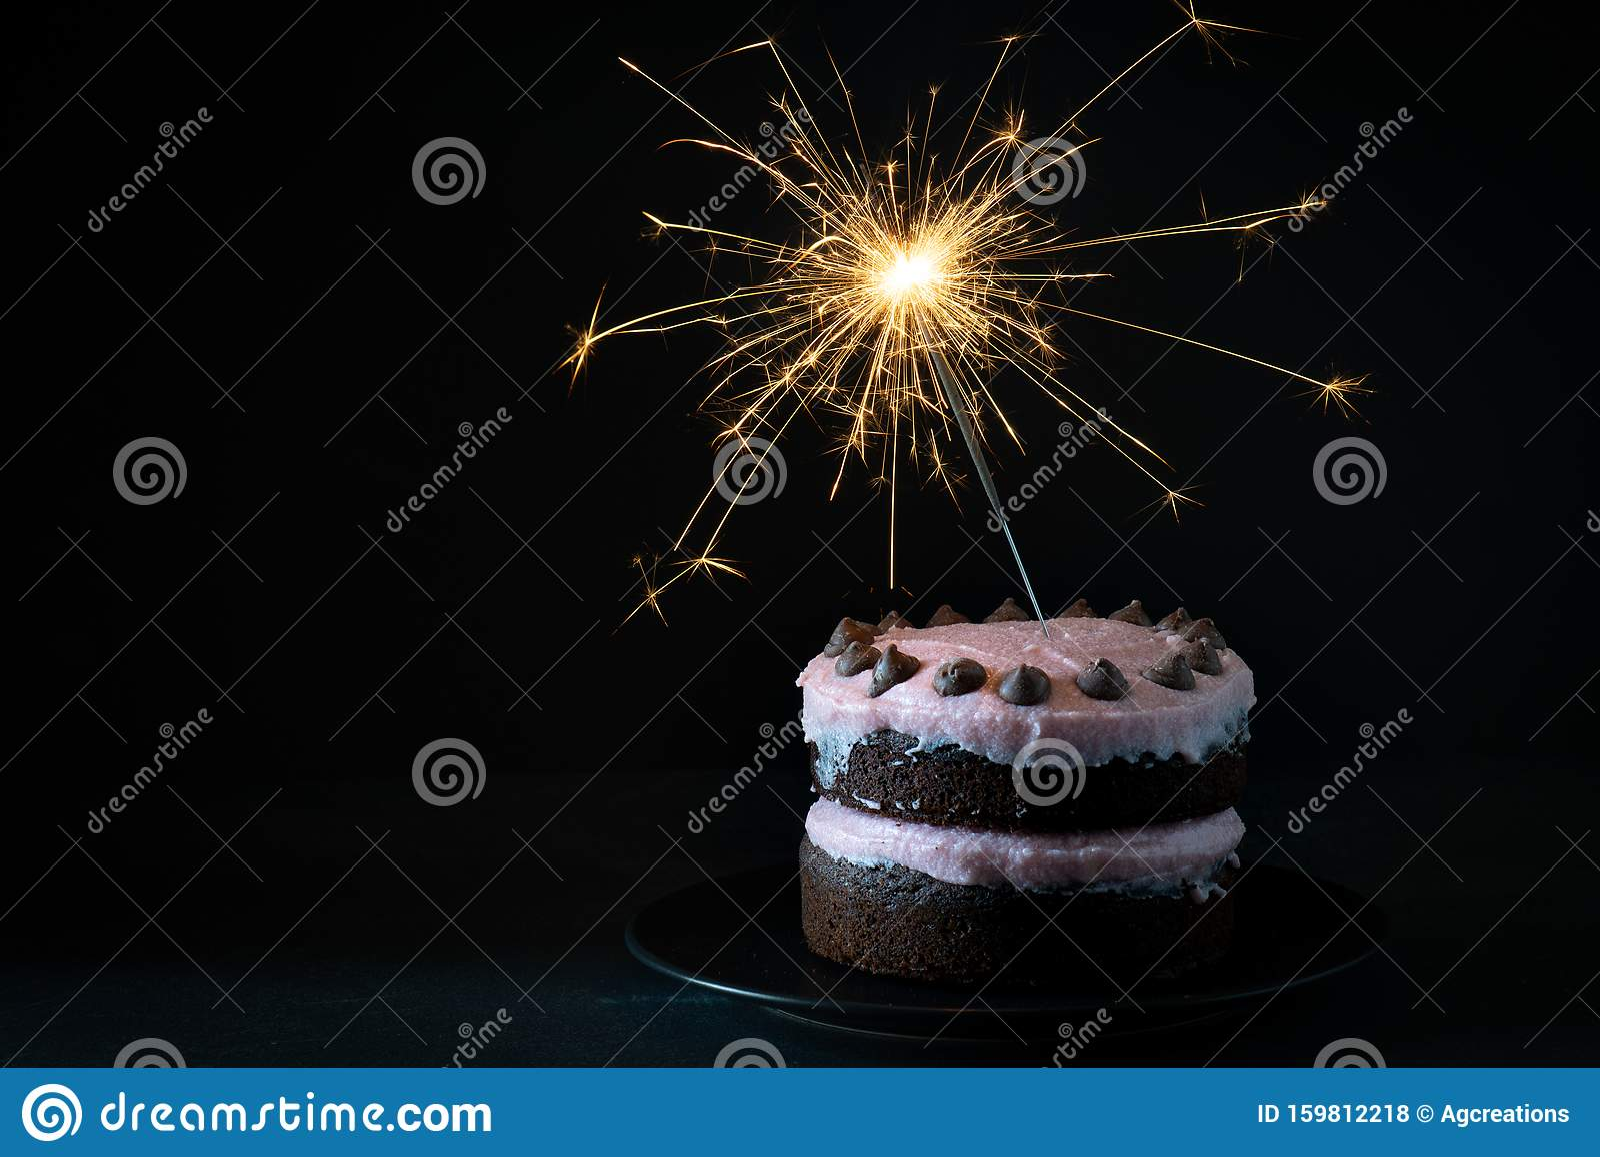 Peachy Chocolate Cake With Sparkler Dark Background Stock Photo Image Funny Birthday Cards Online Inifodamsfinfo